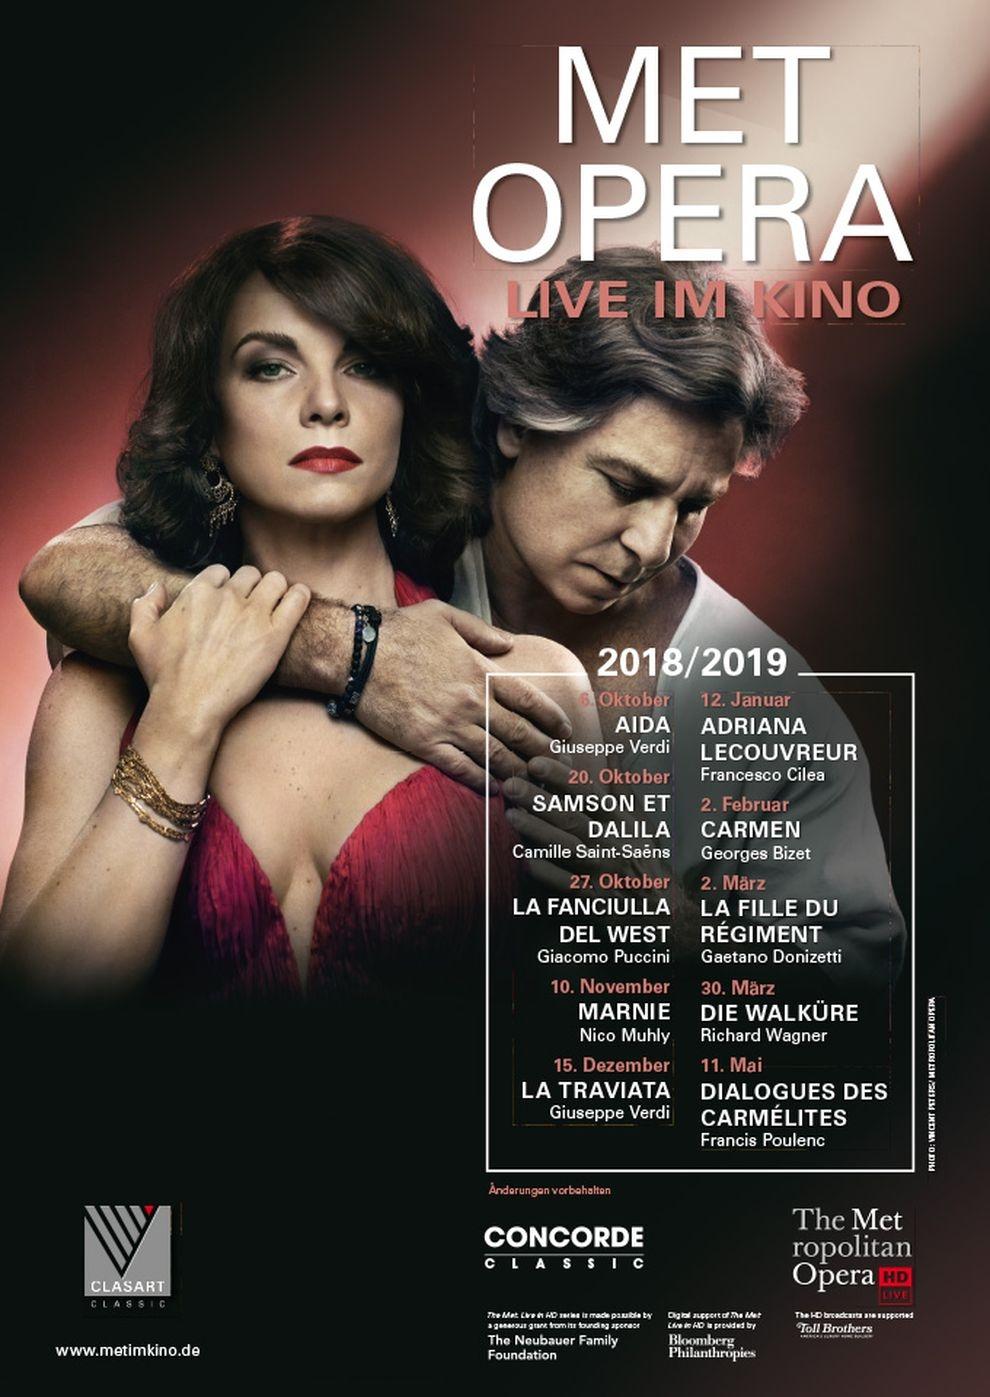 Met Opera 2018/19: Adriana LeCouvreu (Cilea) (Poster)